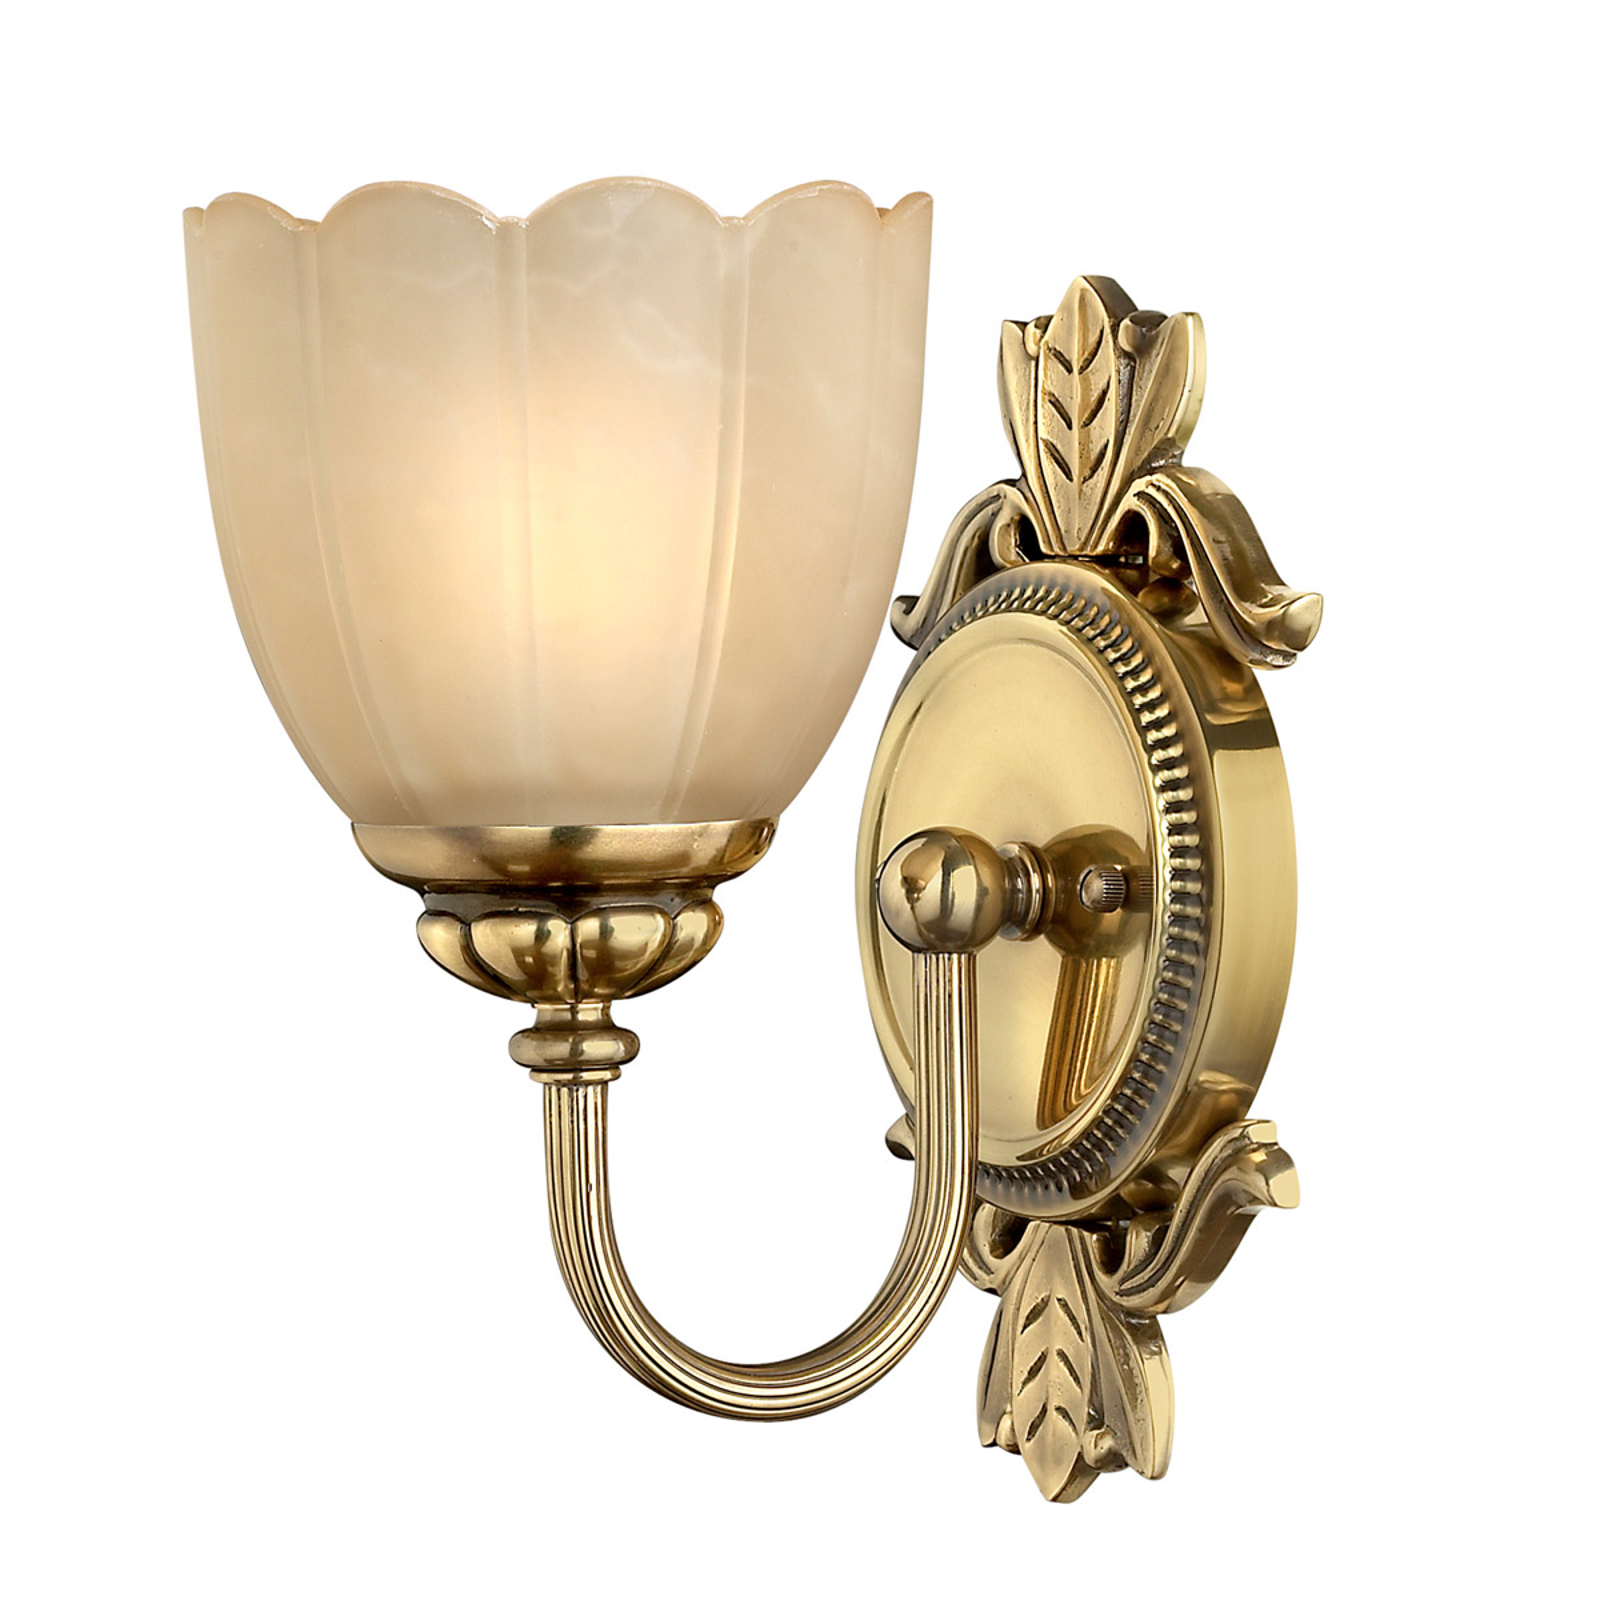 Handgemaakte badkamer wandlamp Isabella